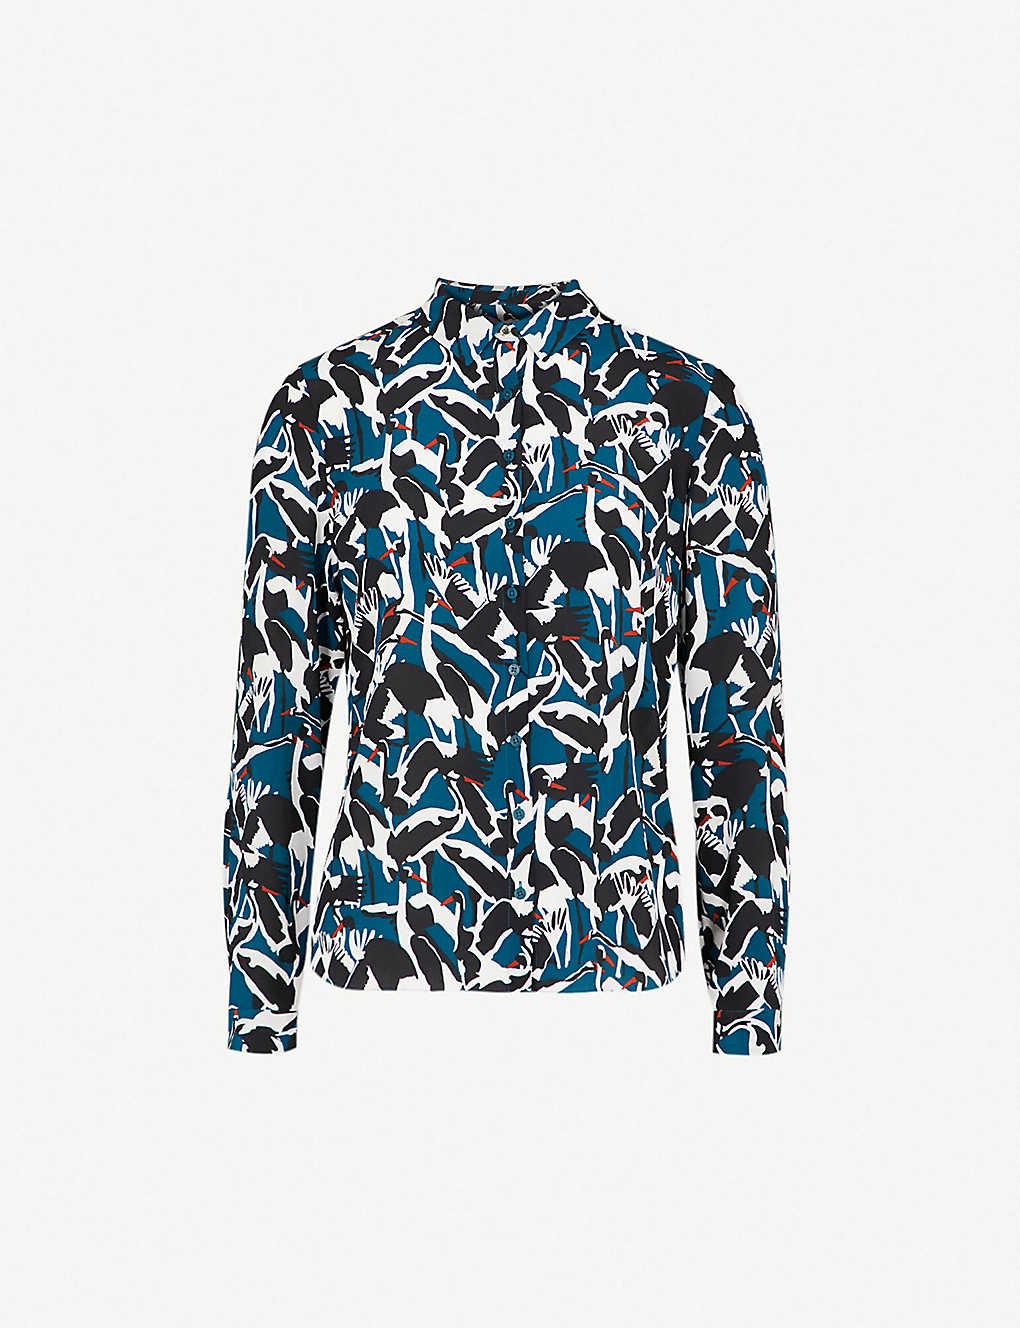 35db90f9c737 TED BAKER - Crane silk-chiffon shirt | Selfridges.com